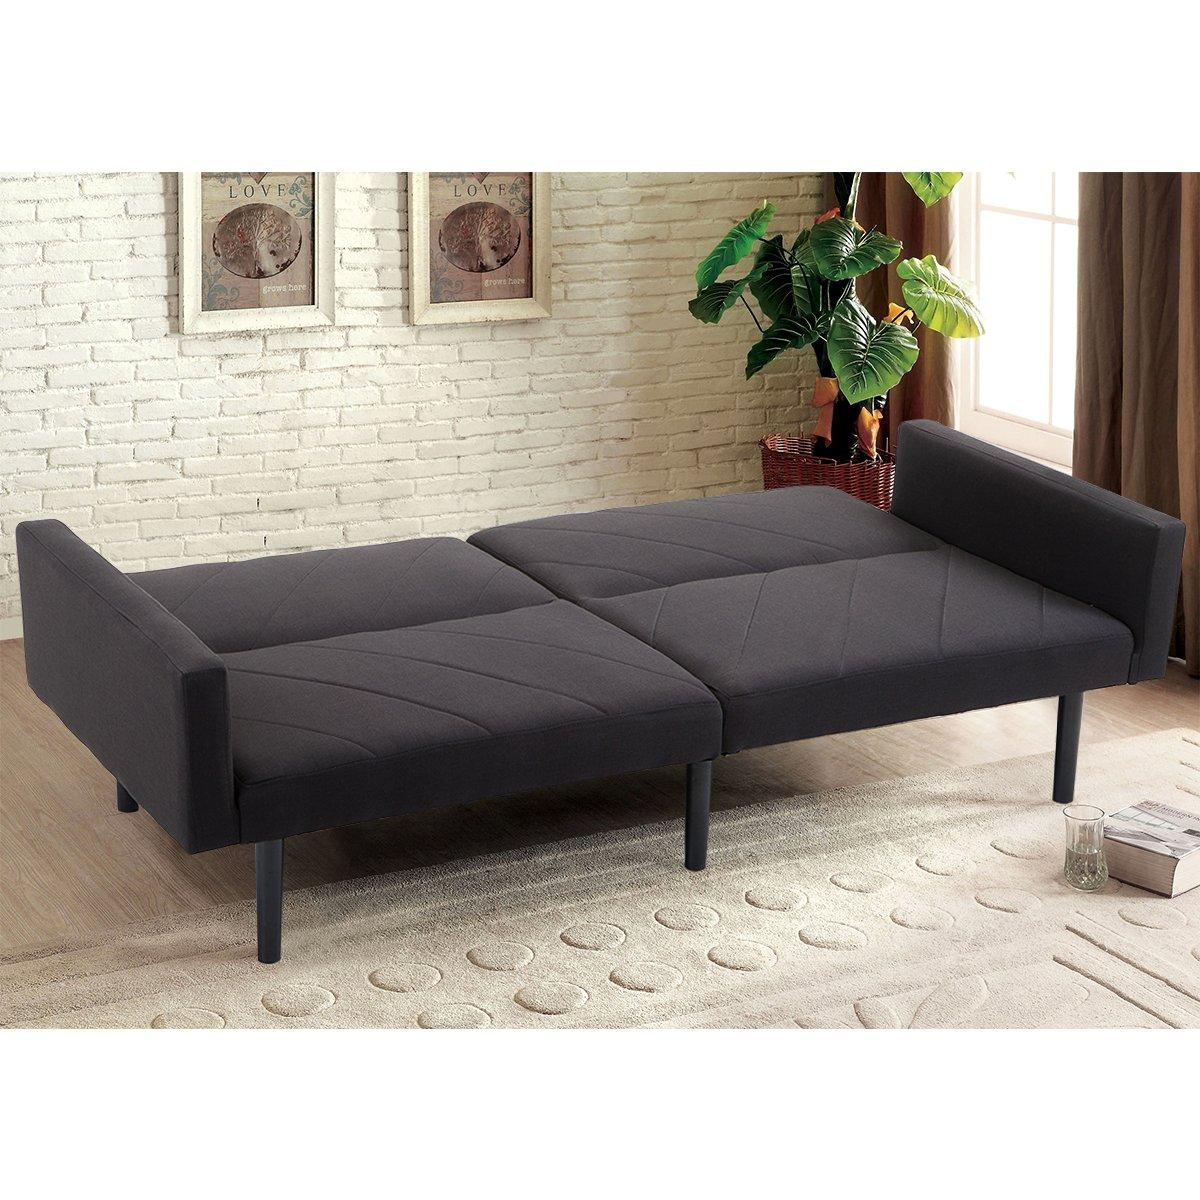 Terrific Amazon Com Giantex Futon Sofa Bed Convertible Recliner Gamerscity Chair Design For Home Gamerscityorg